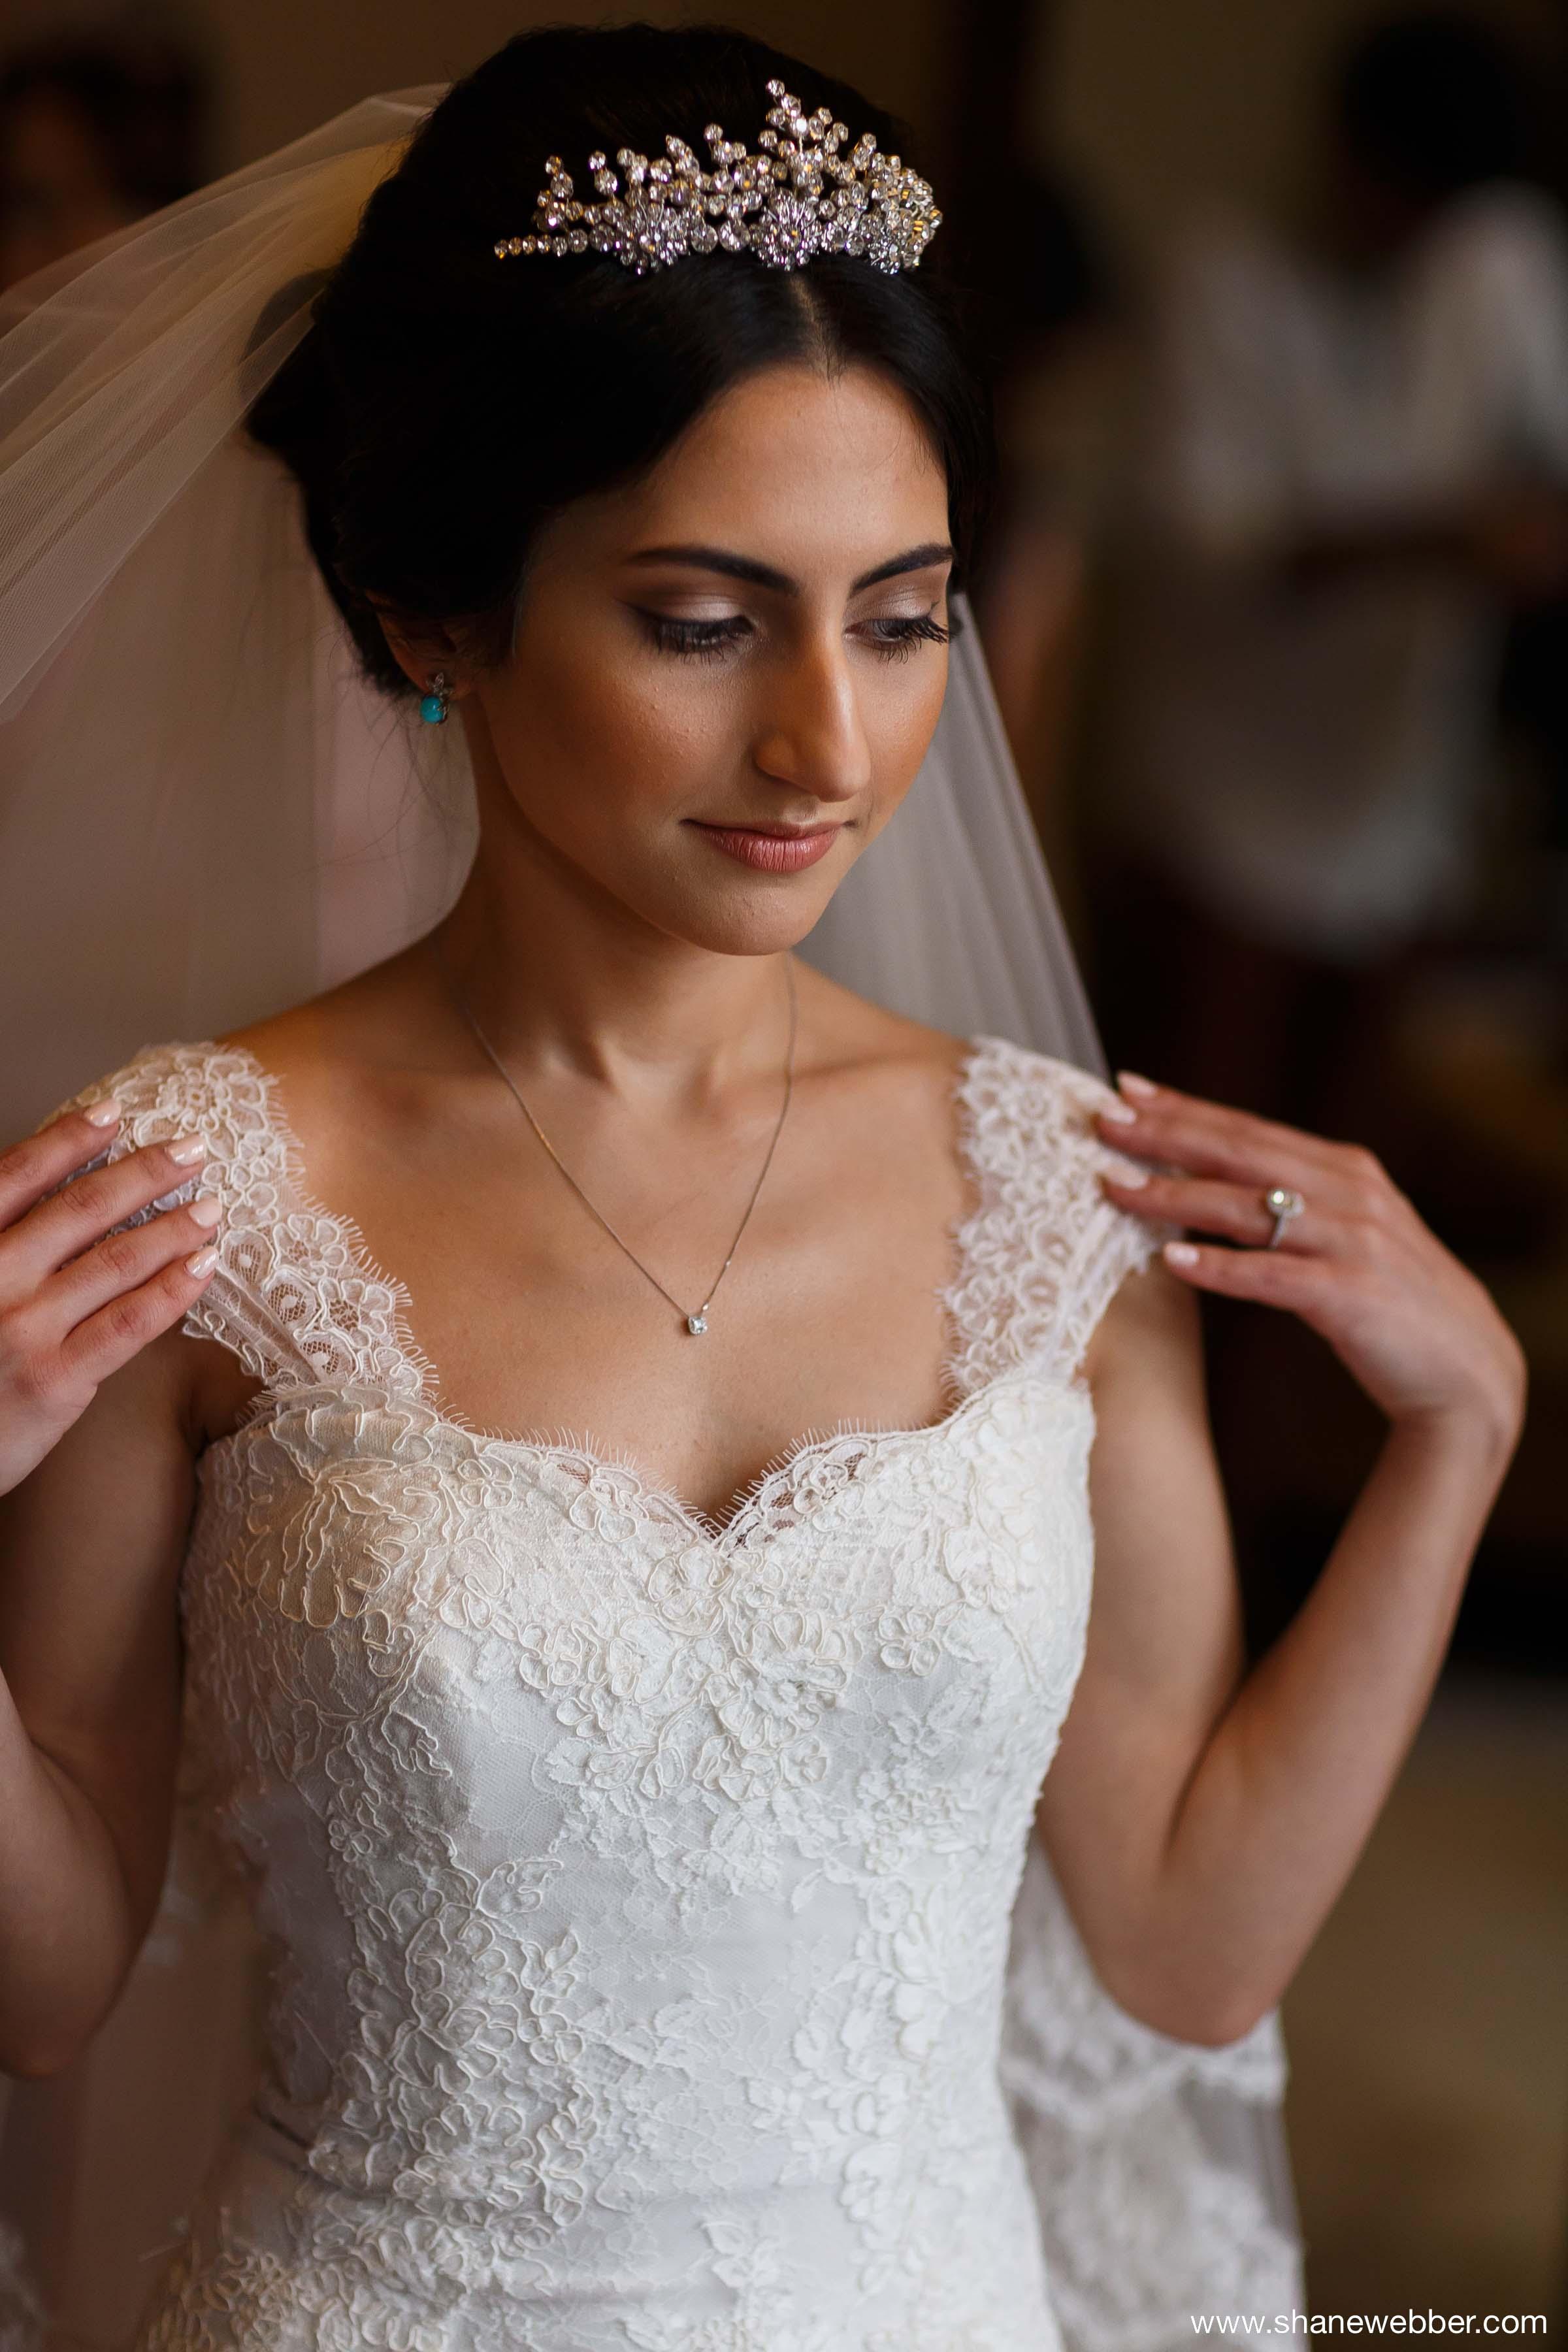 Iranian Bride Www Pixshark Com Images Galleries With A Bite